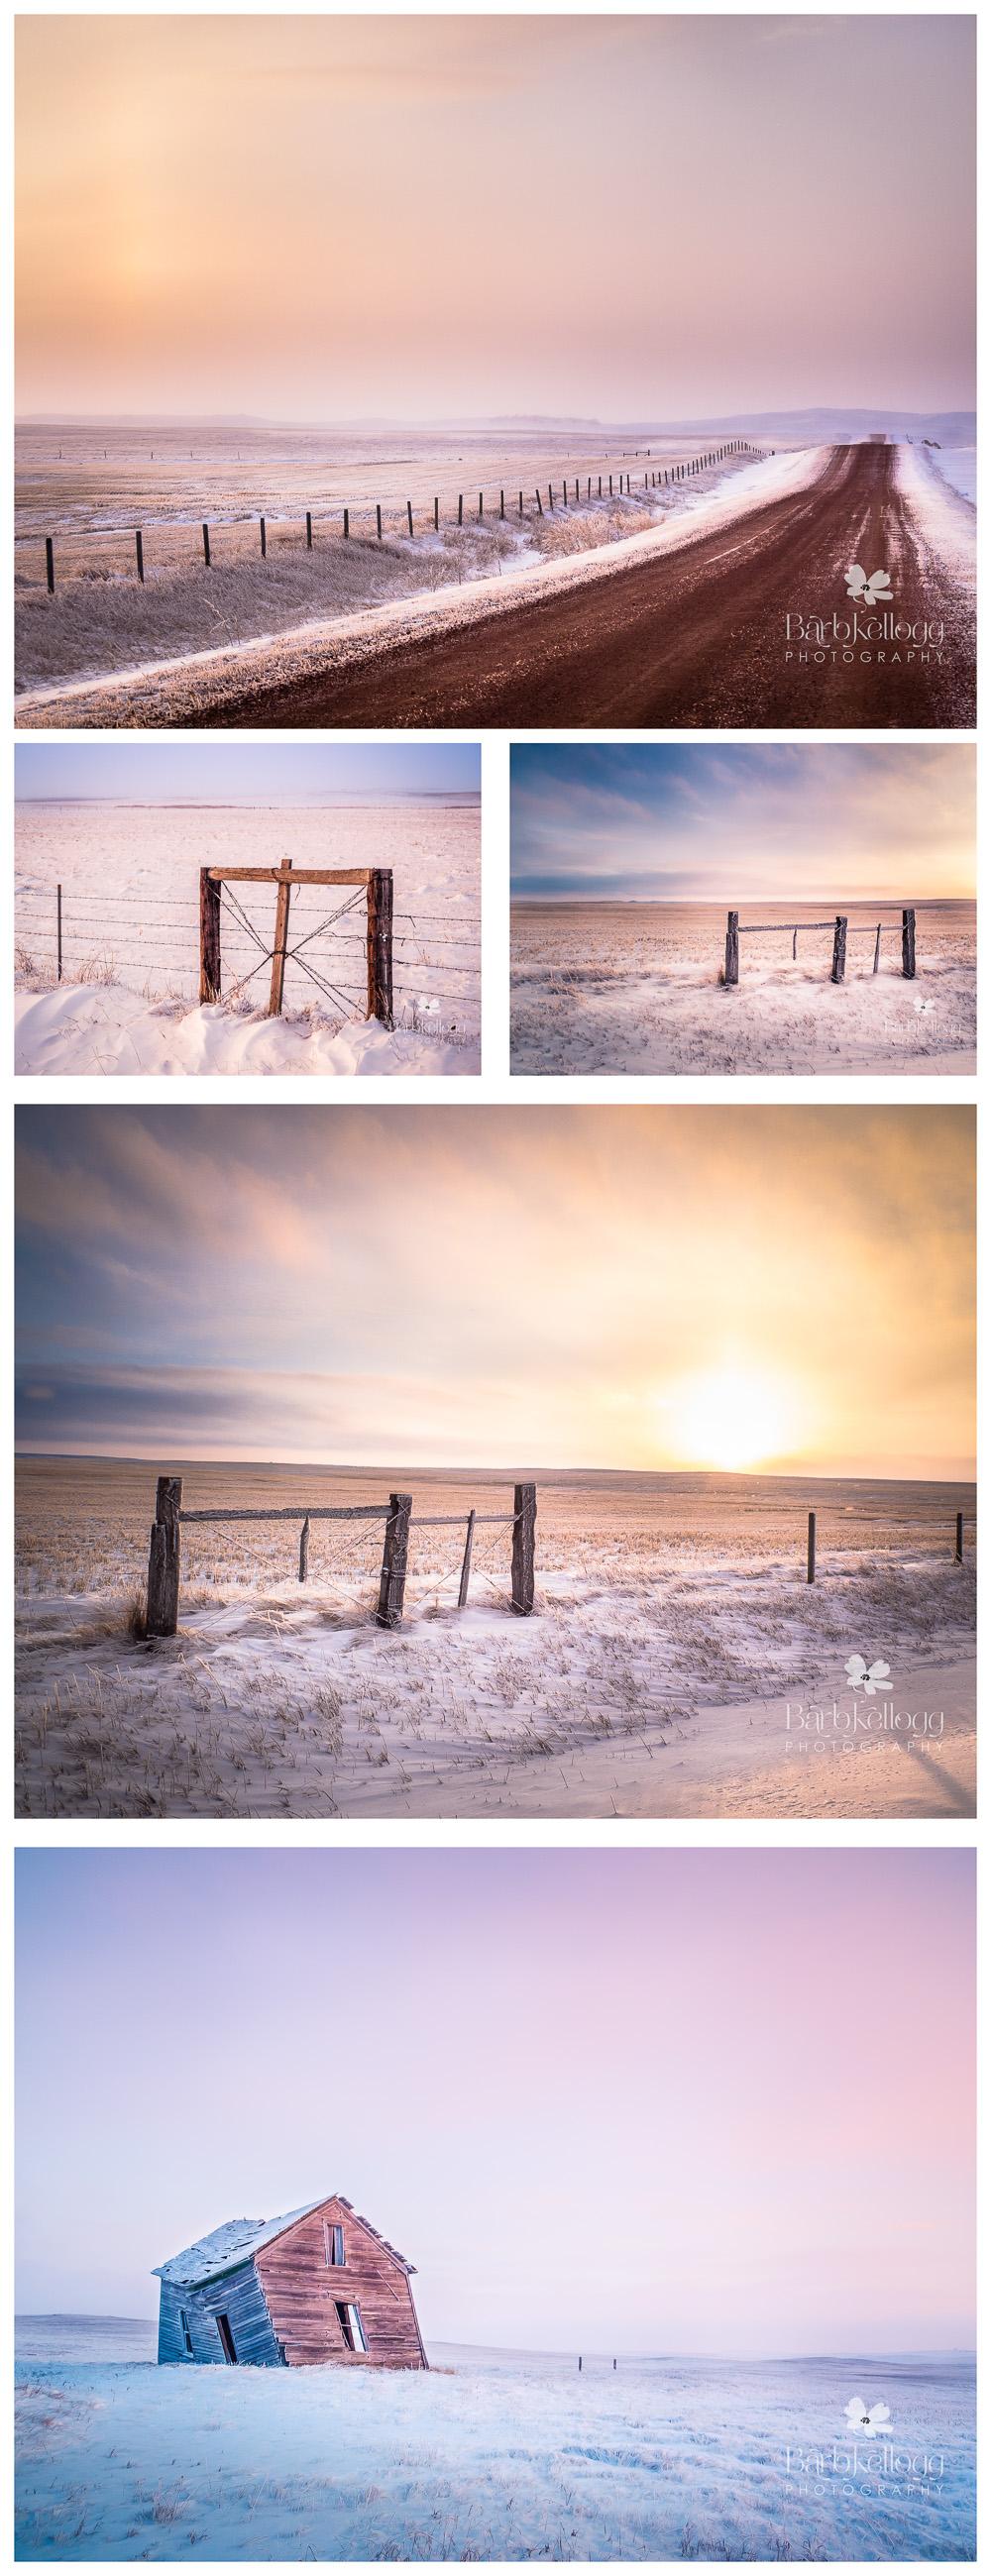 montana_winter_blog_collage1.jpg